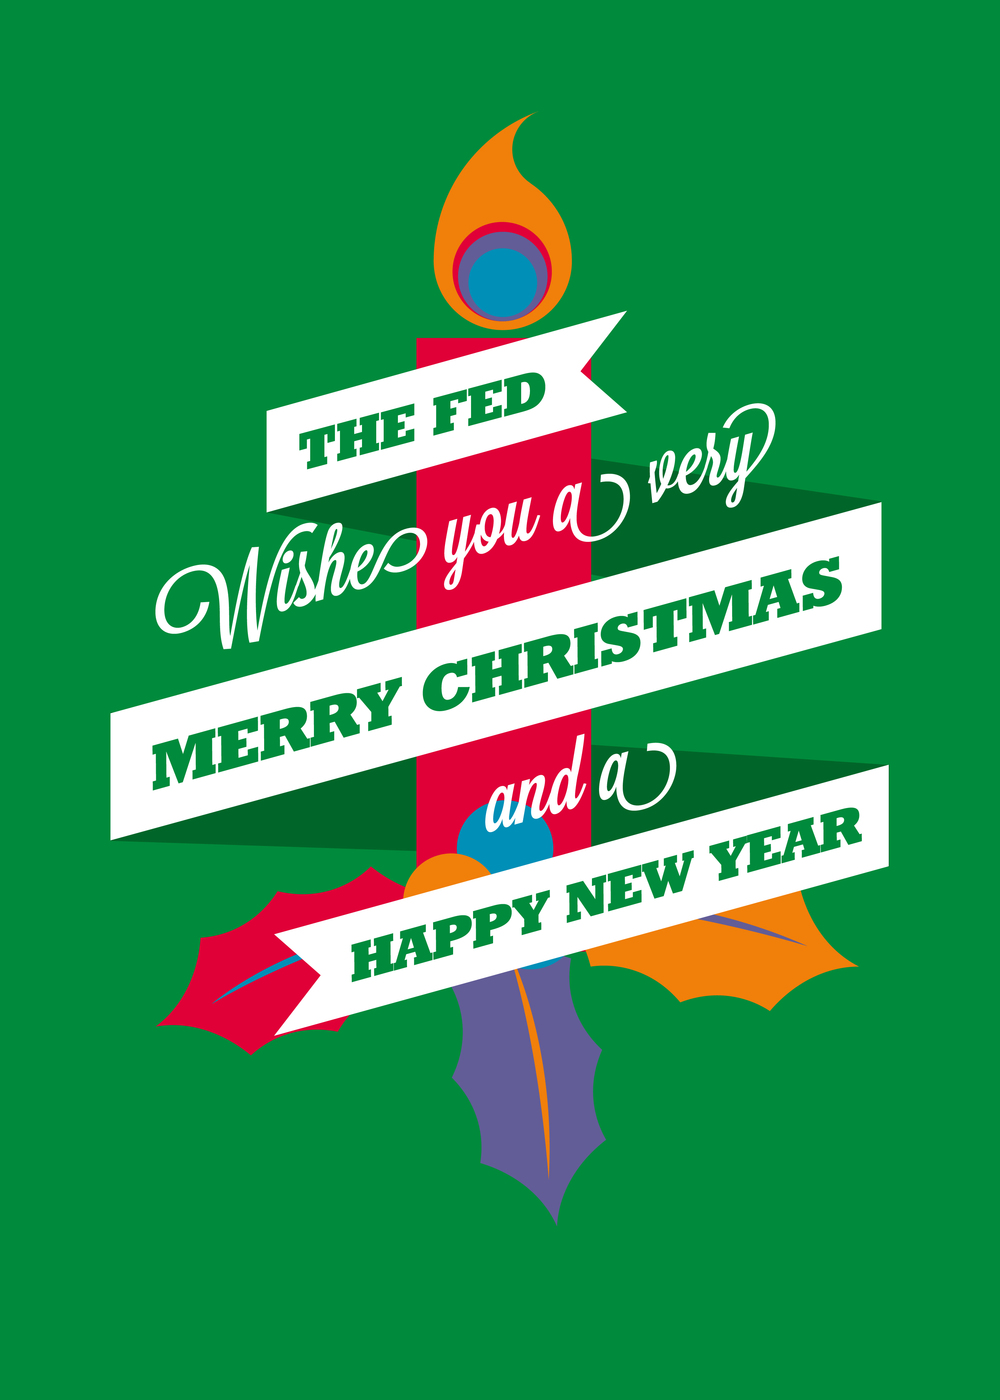 TheFed_ChristmasCard_2013-03.jpg